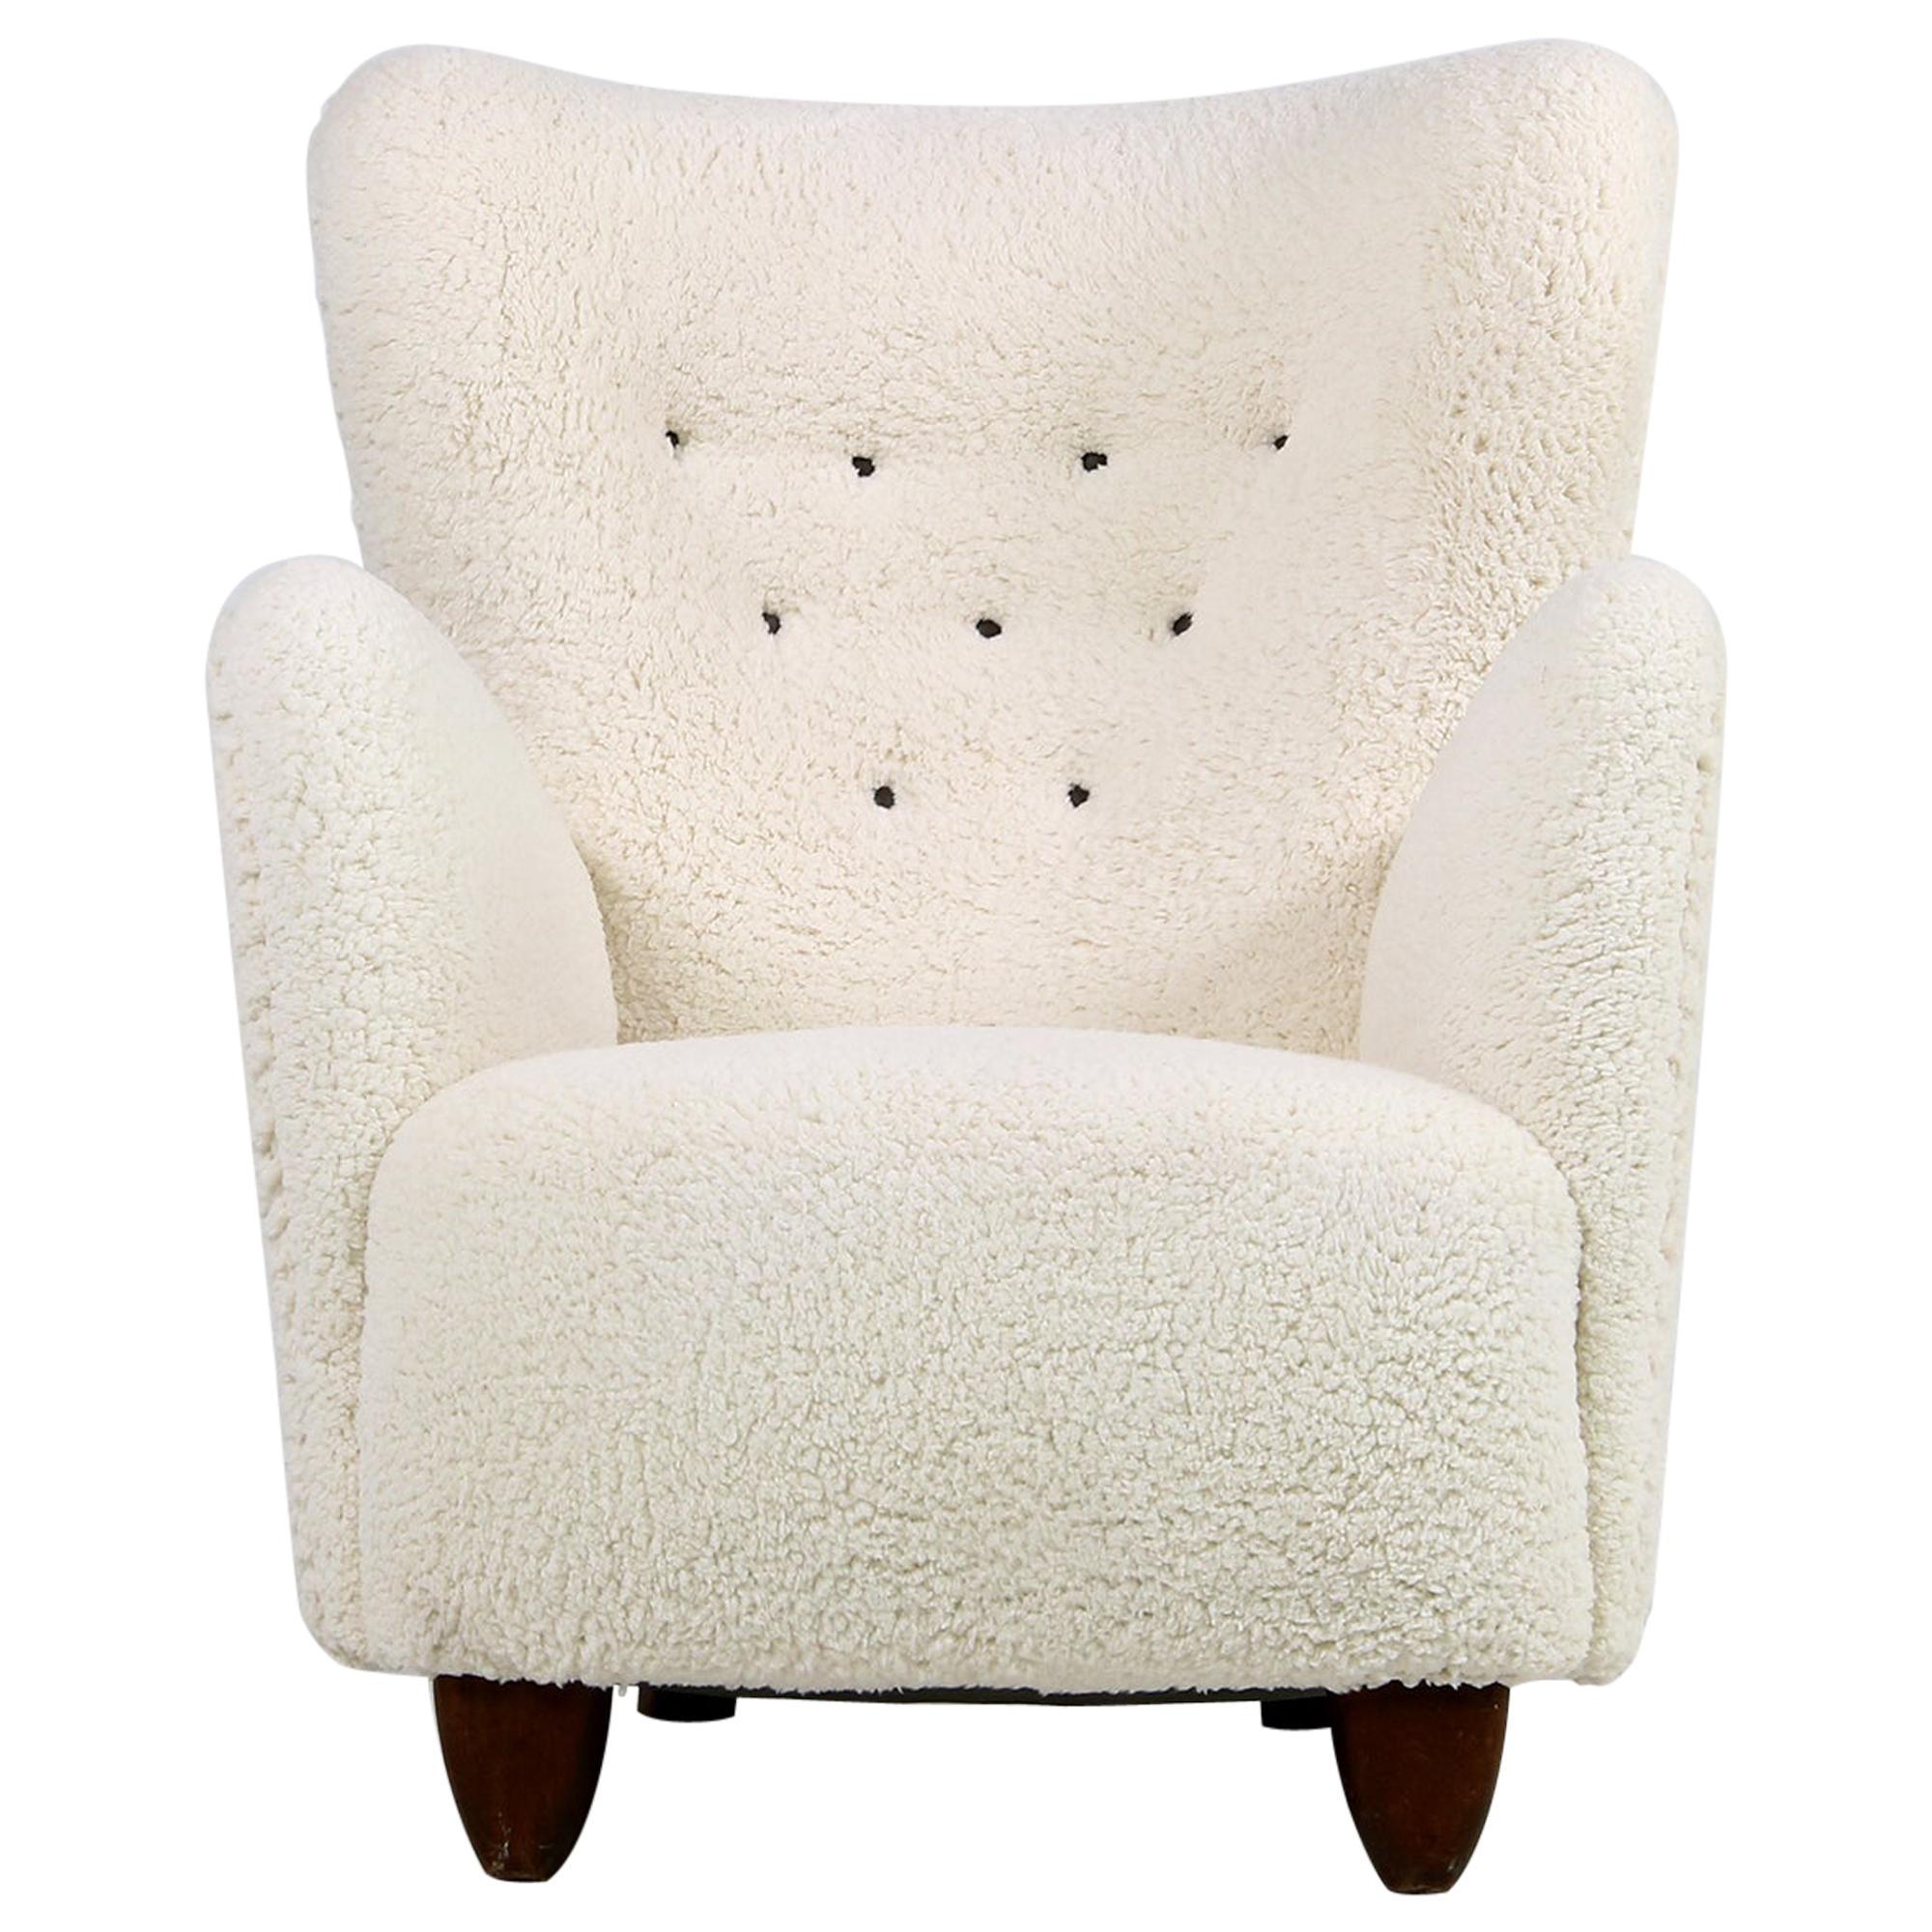 Danish Wingback Lounge Chair 1950 Teddy Fur & Leather, Sheepskin Made in Denmark